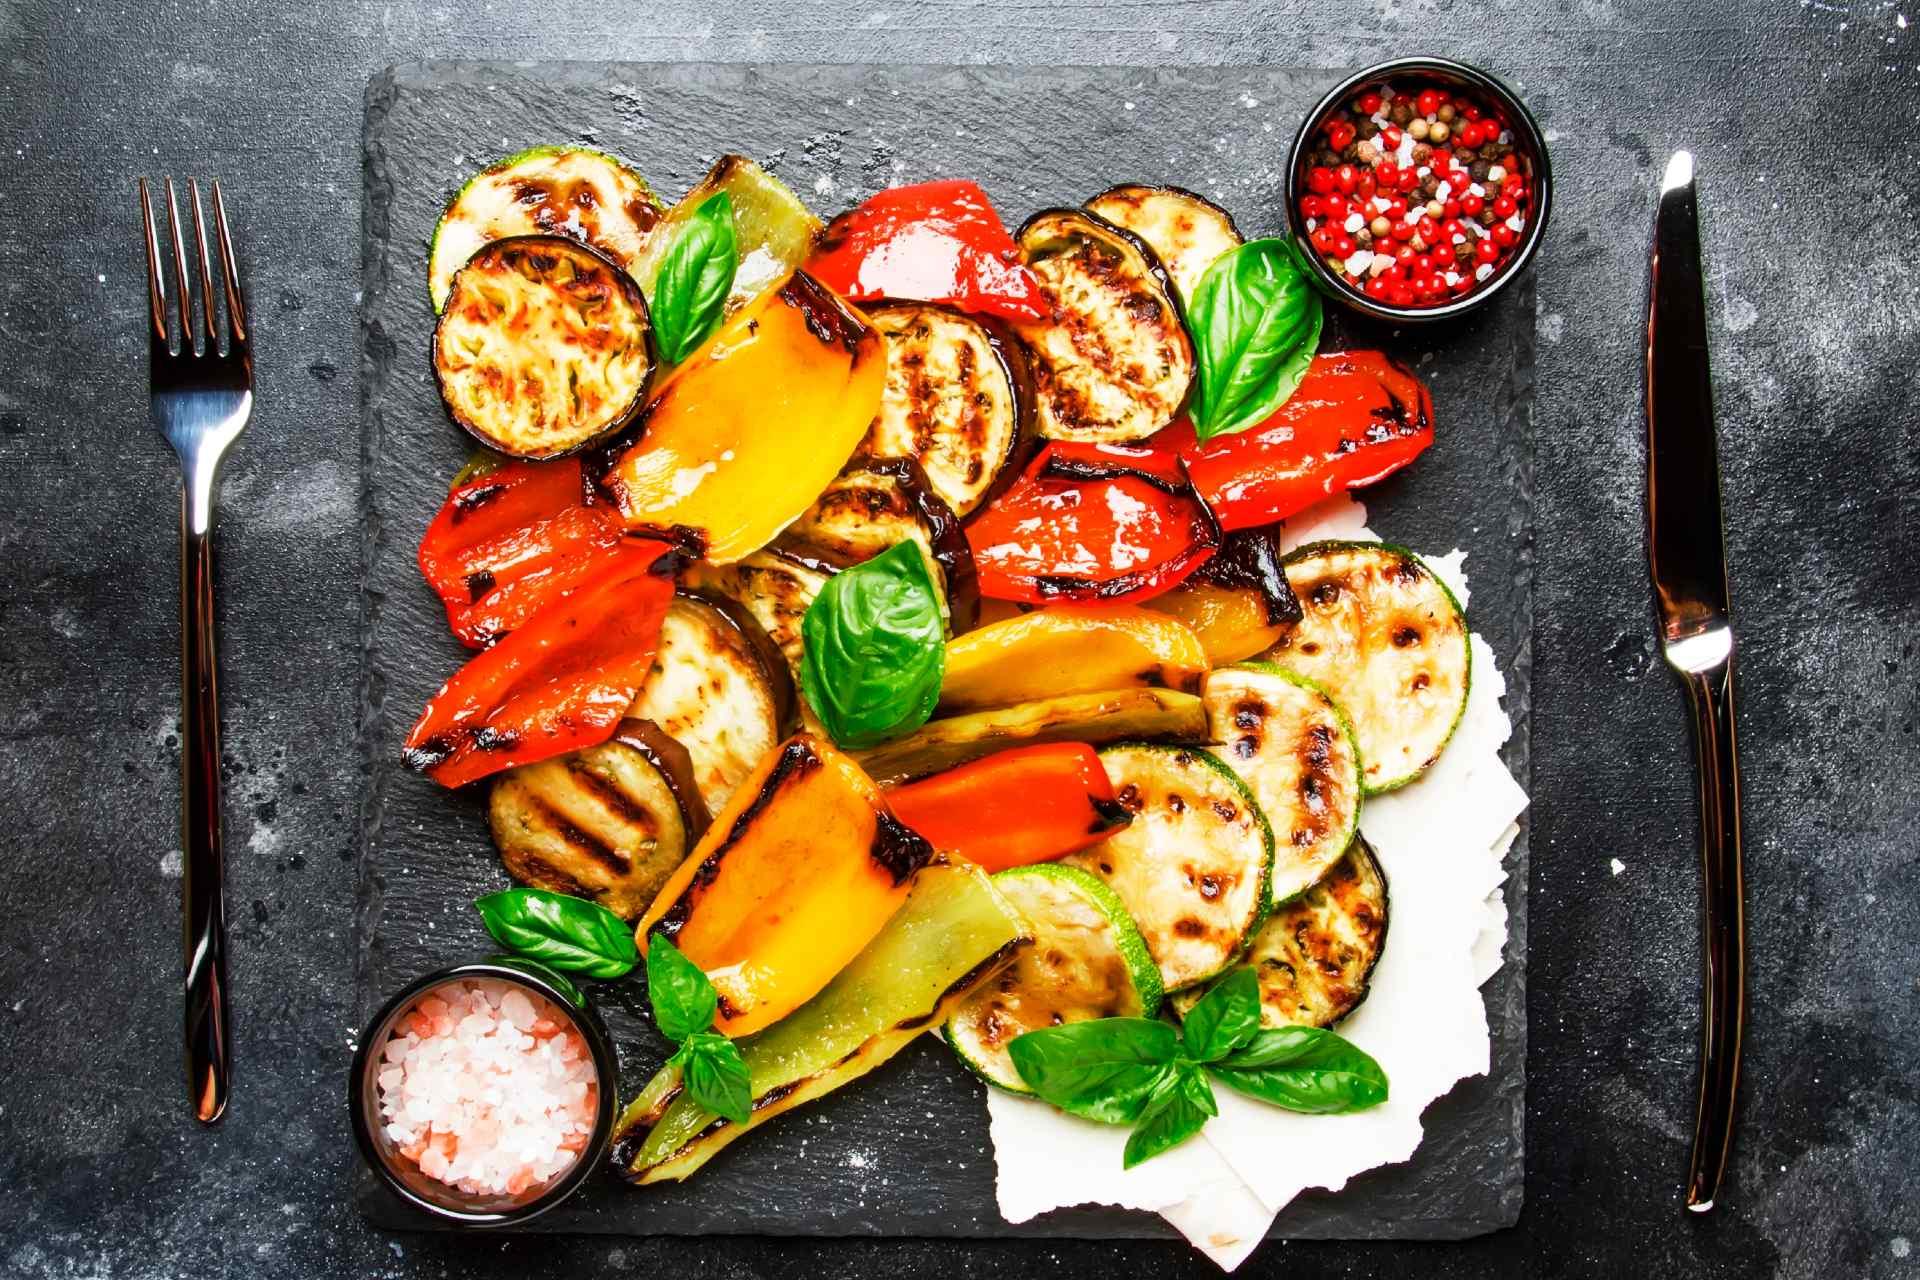 vegetarian-meal-roasted-vegetable-salad